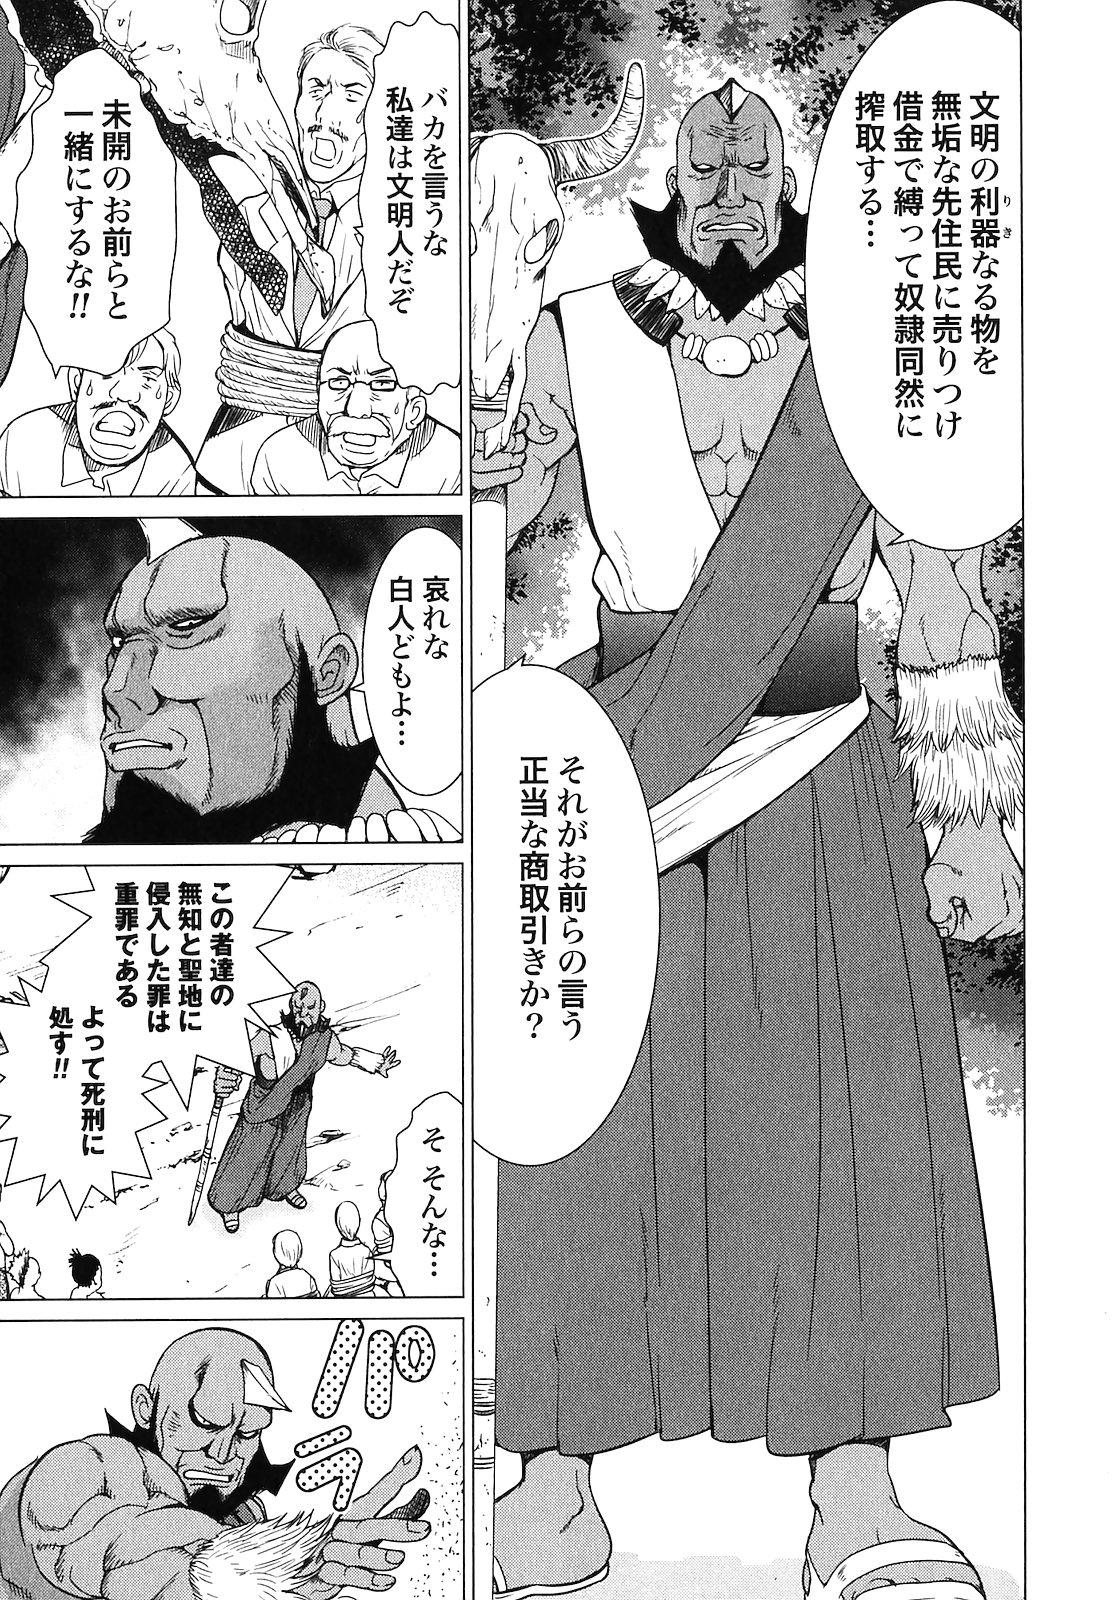 Makyo no Shanana Vol.02 78